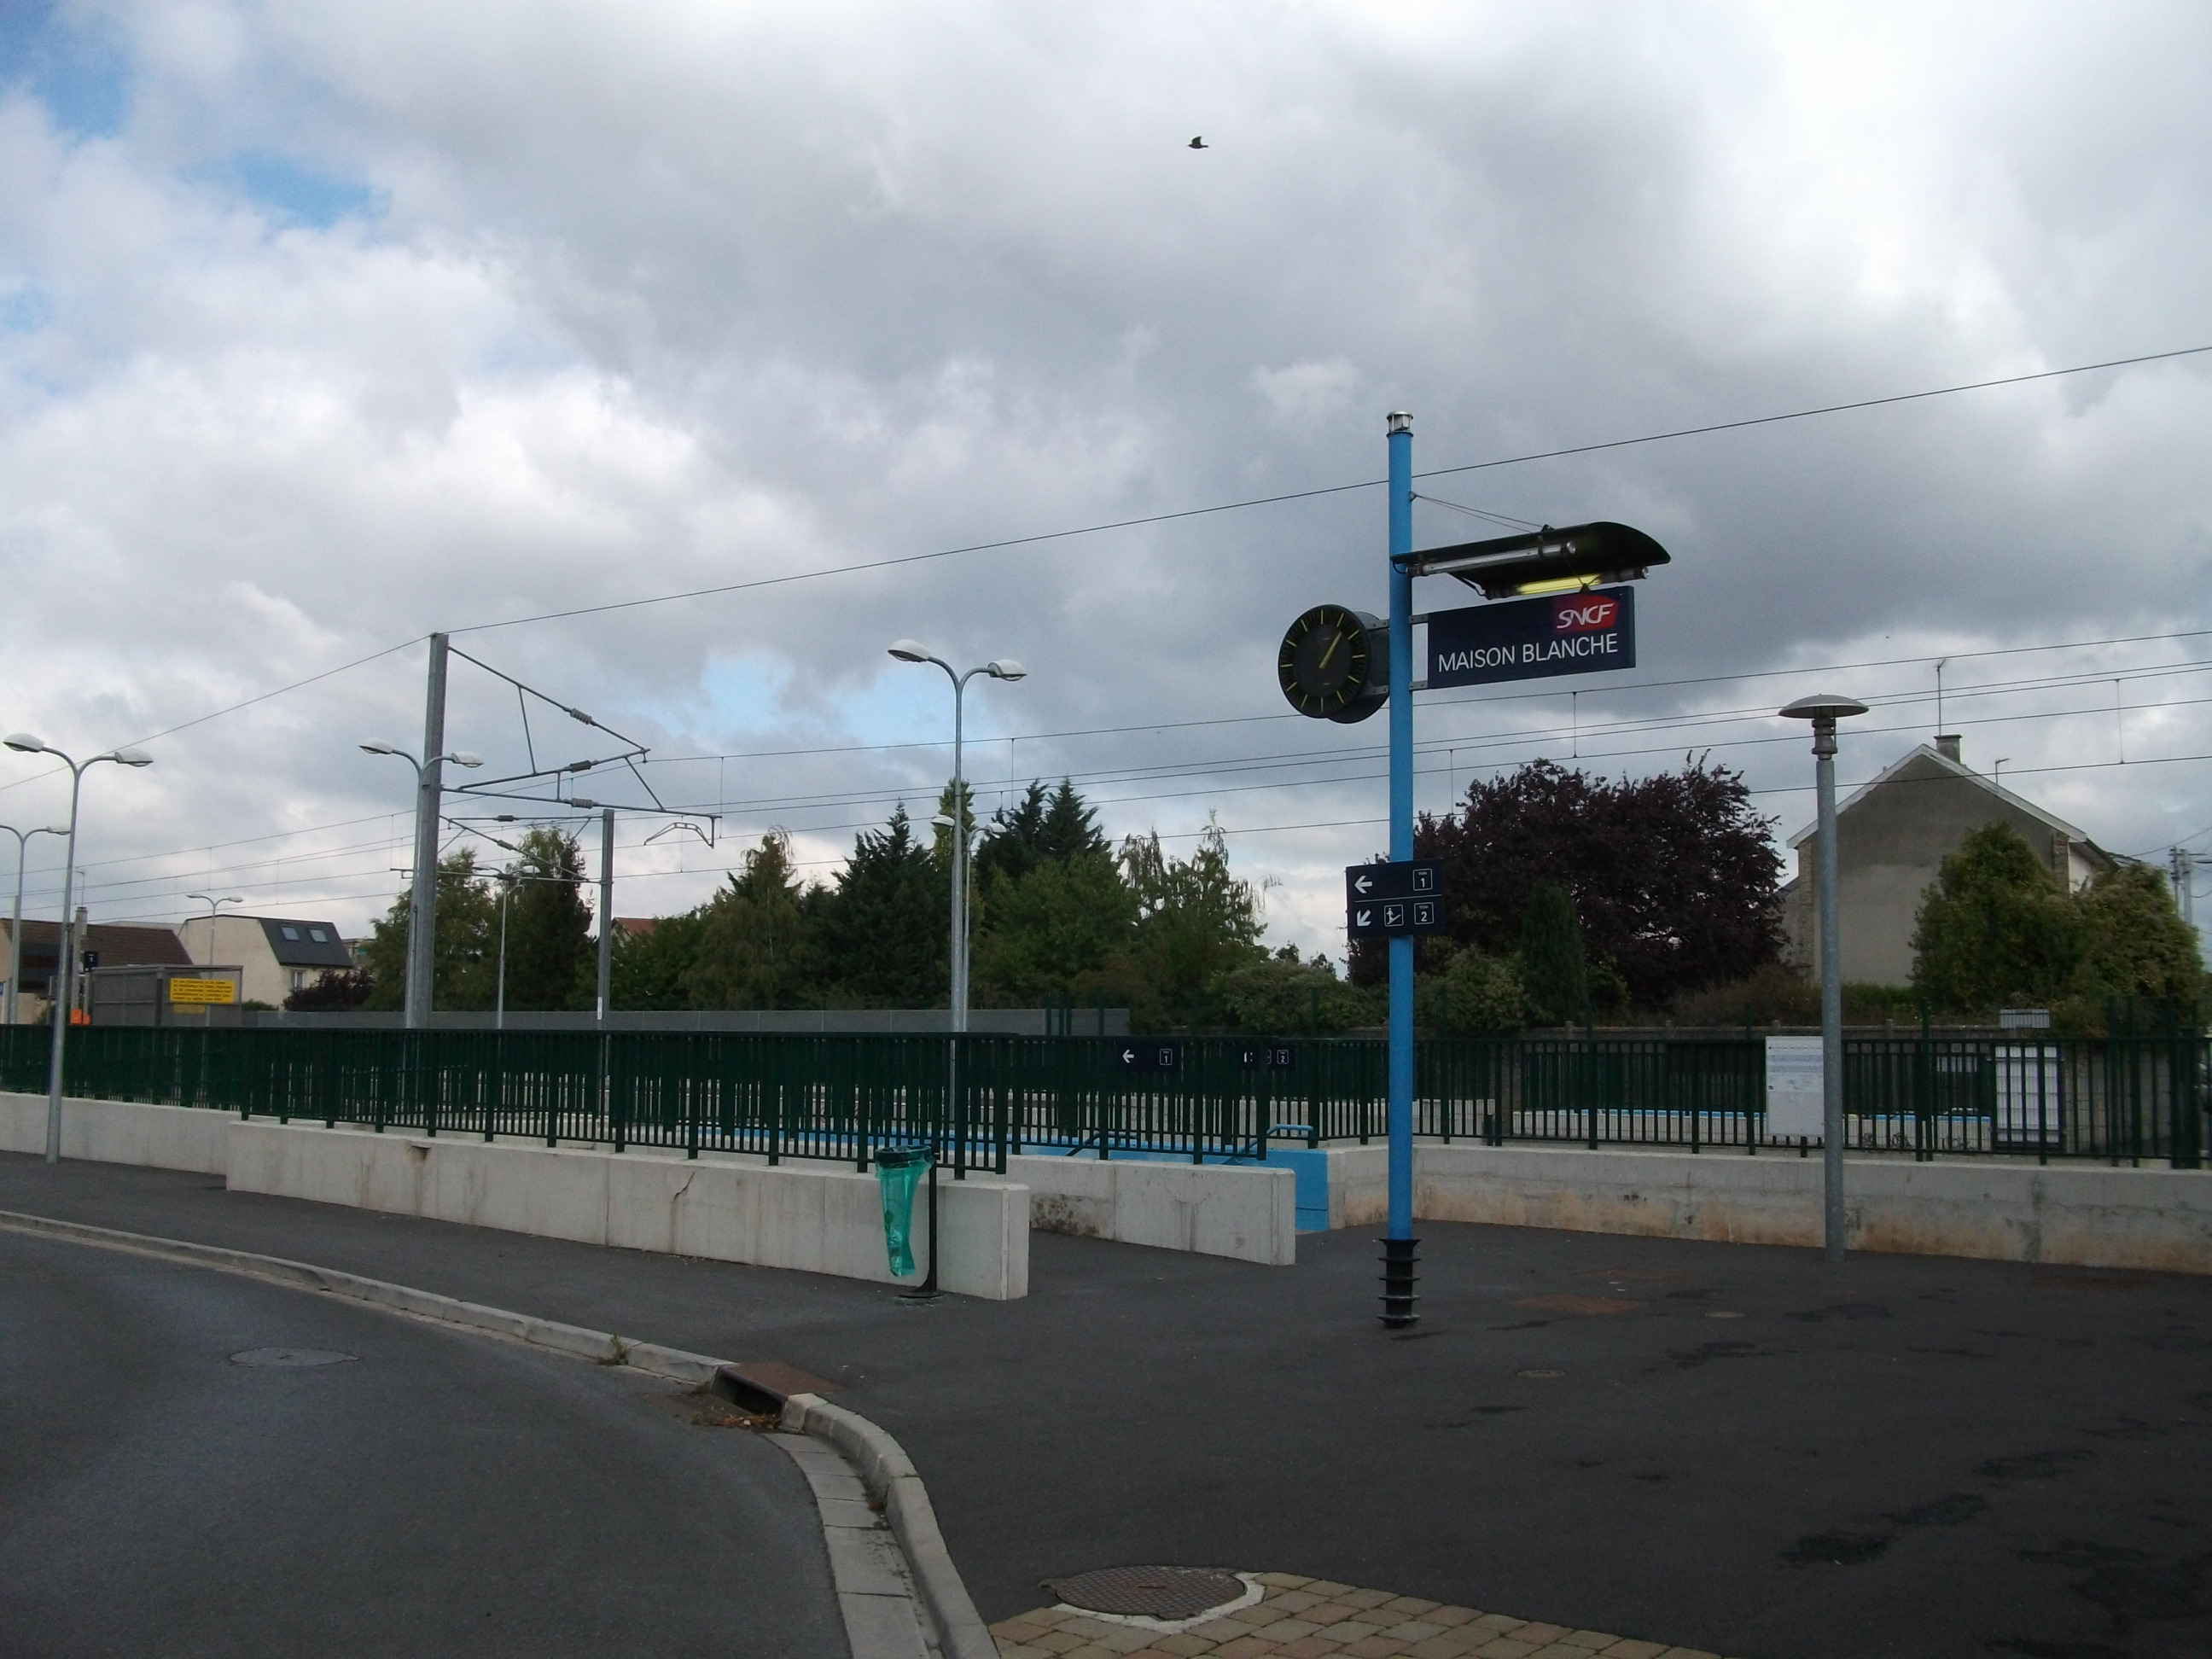 Reims-Maison-Blanche station - Wikipedia